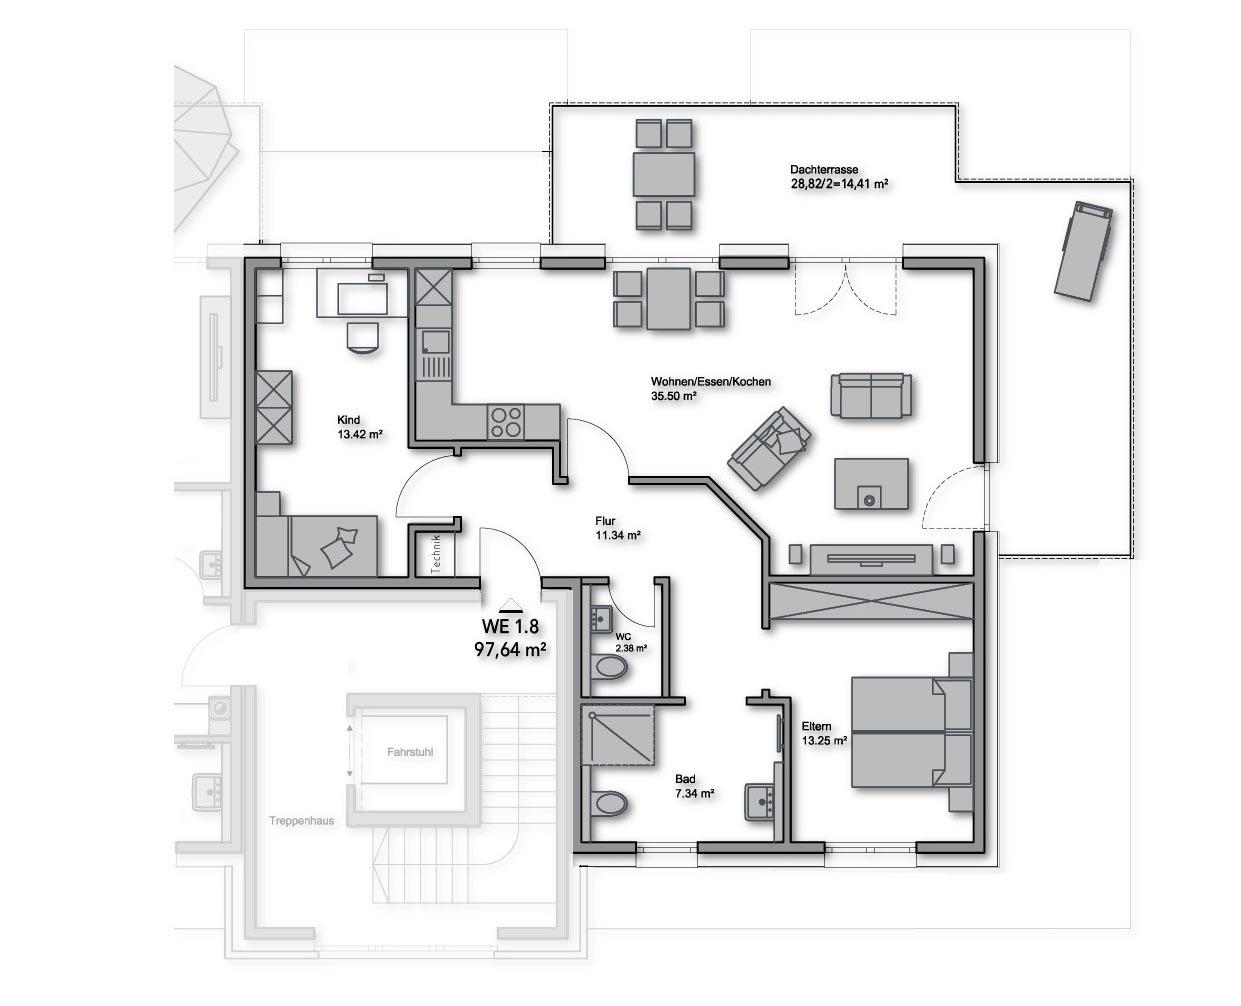 Penthouse-Nr.: 1.8 - 97,64 m²